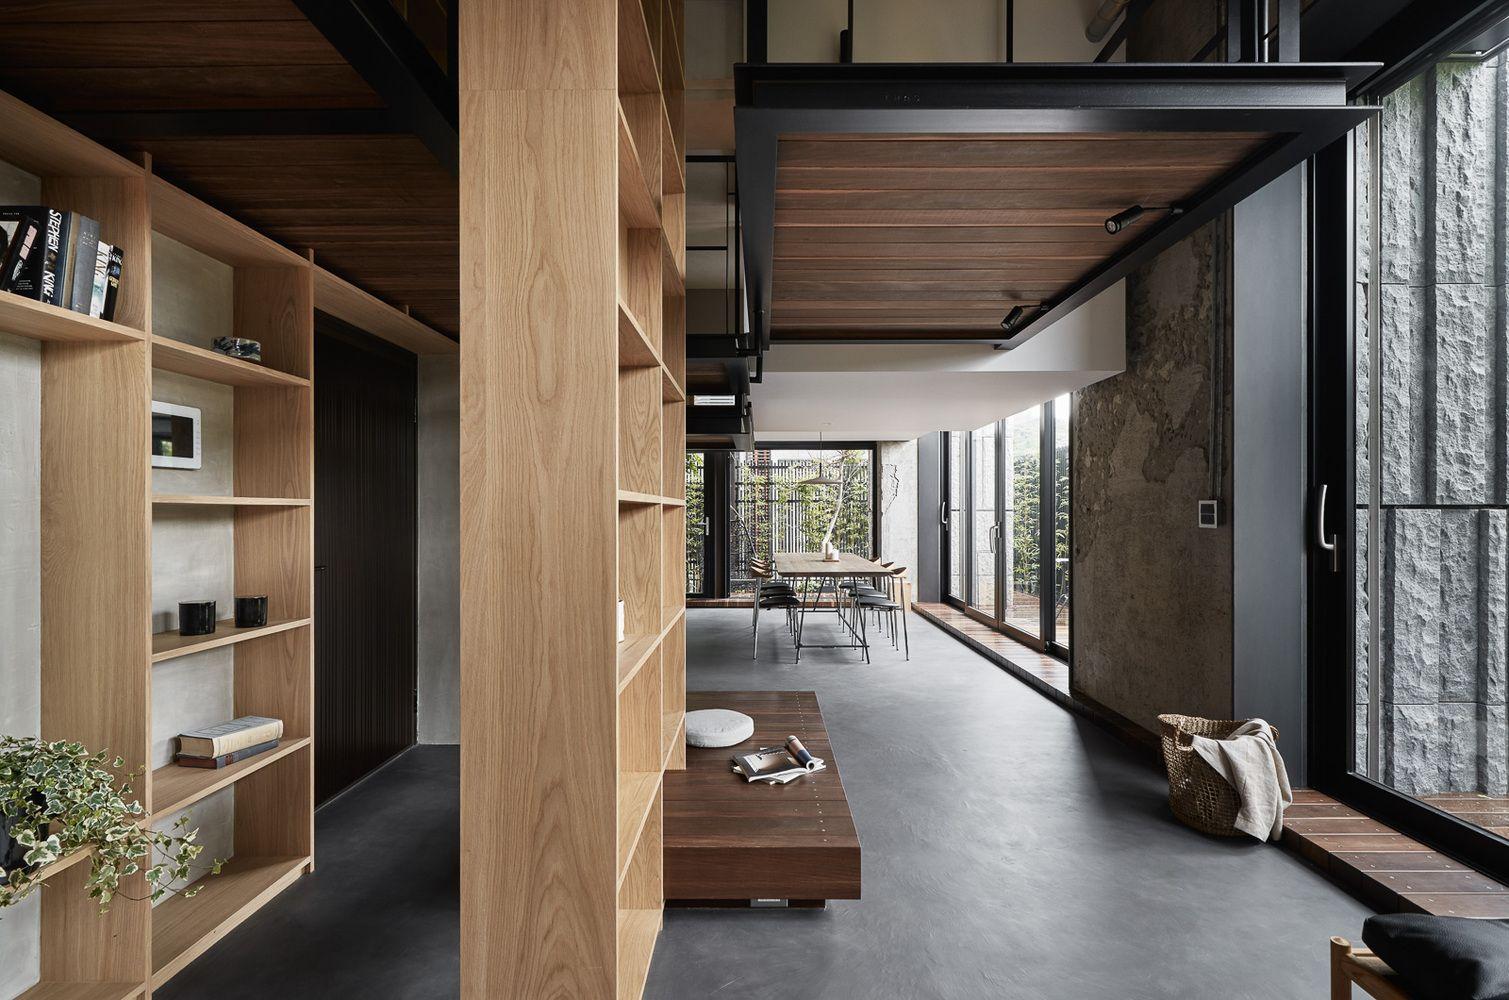 Gallery Of Life In Tree House Soar Design Studio 13 House